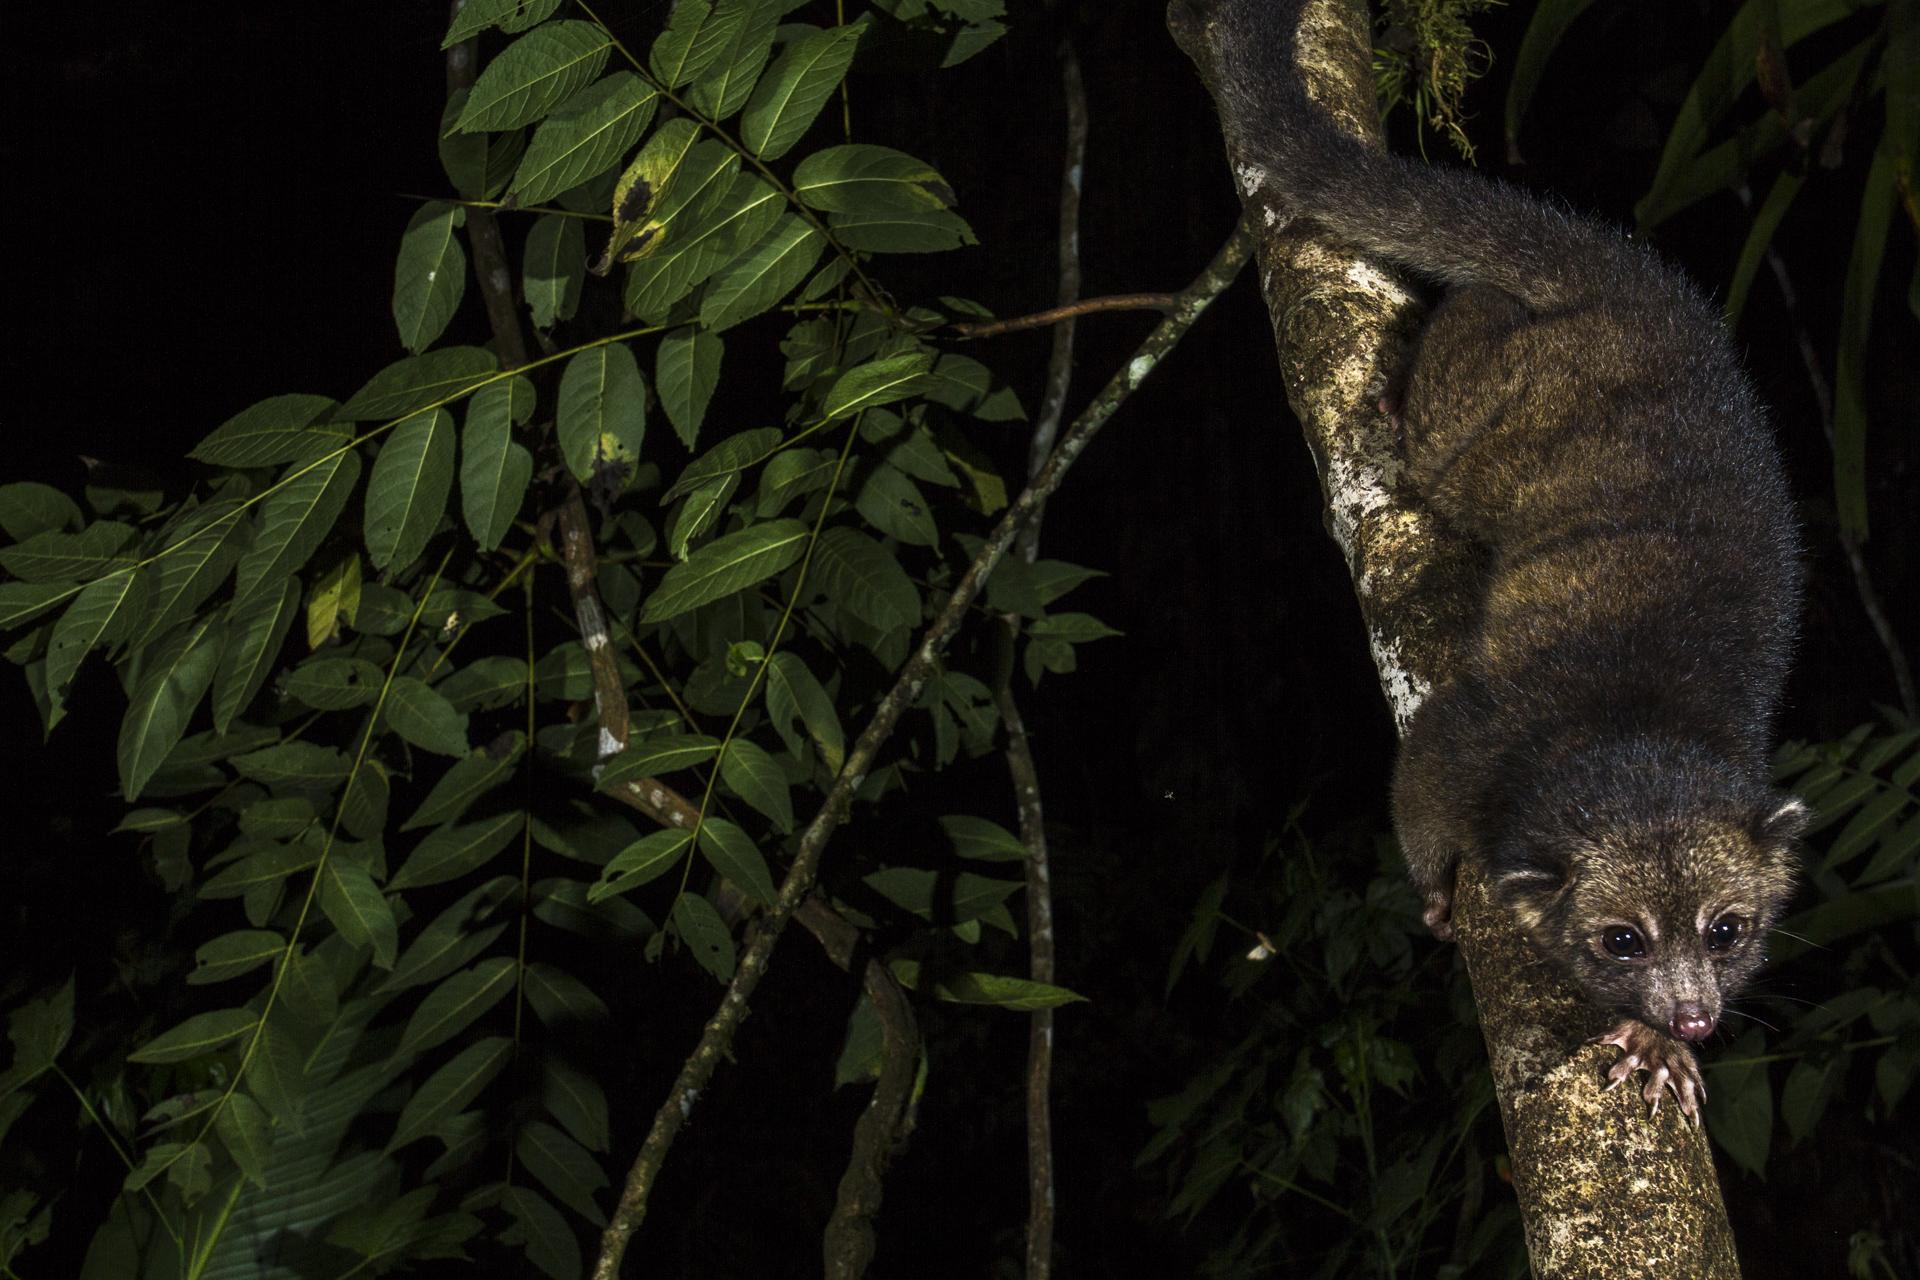 An olinguito descends a tree in Ecuador.